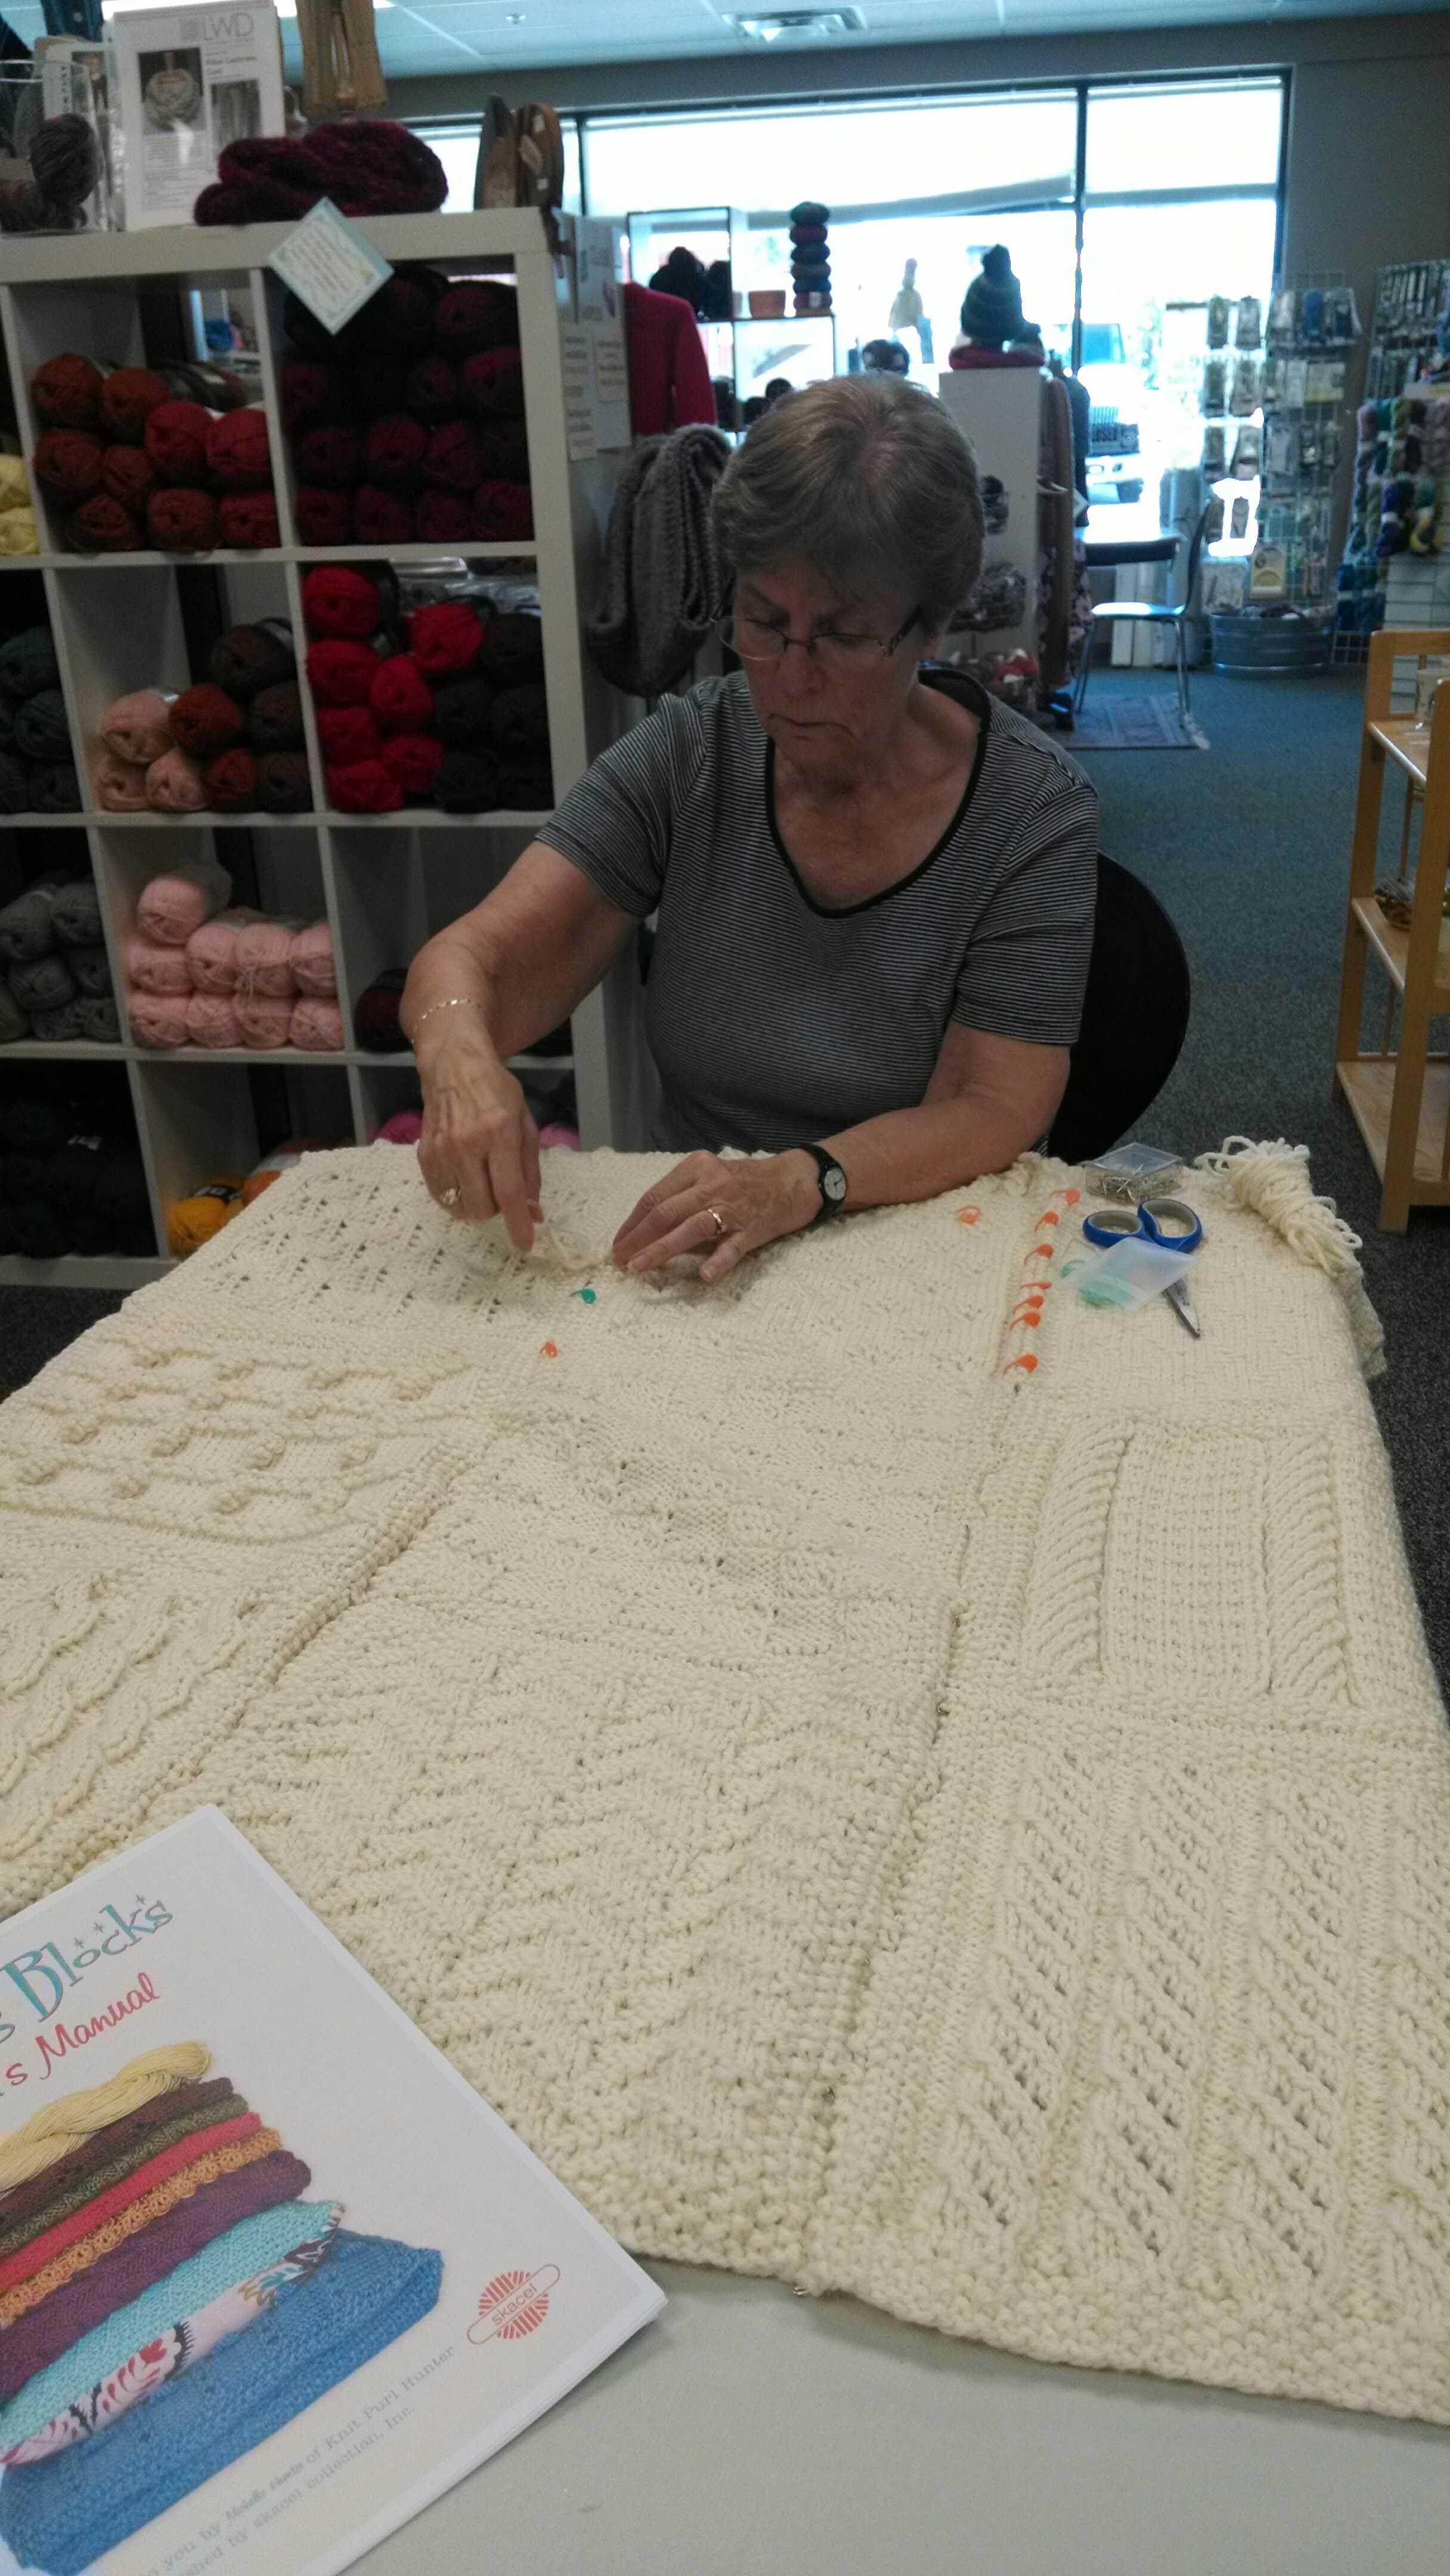 Knitting Or Crocheting Classes : Knitting crochet classes starting northborough ma patch